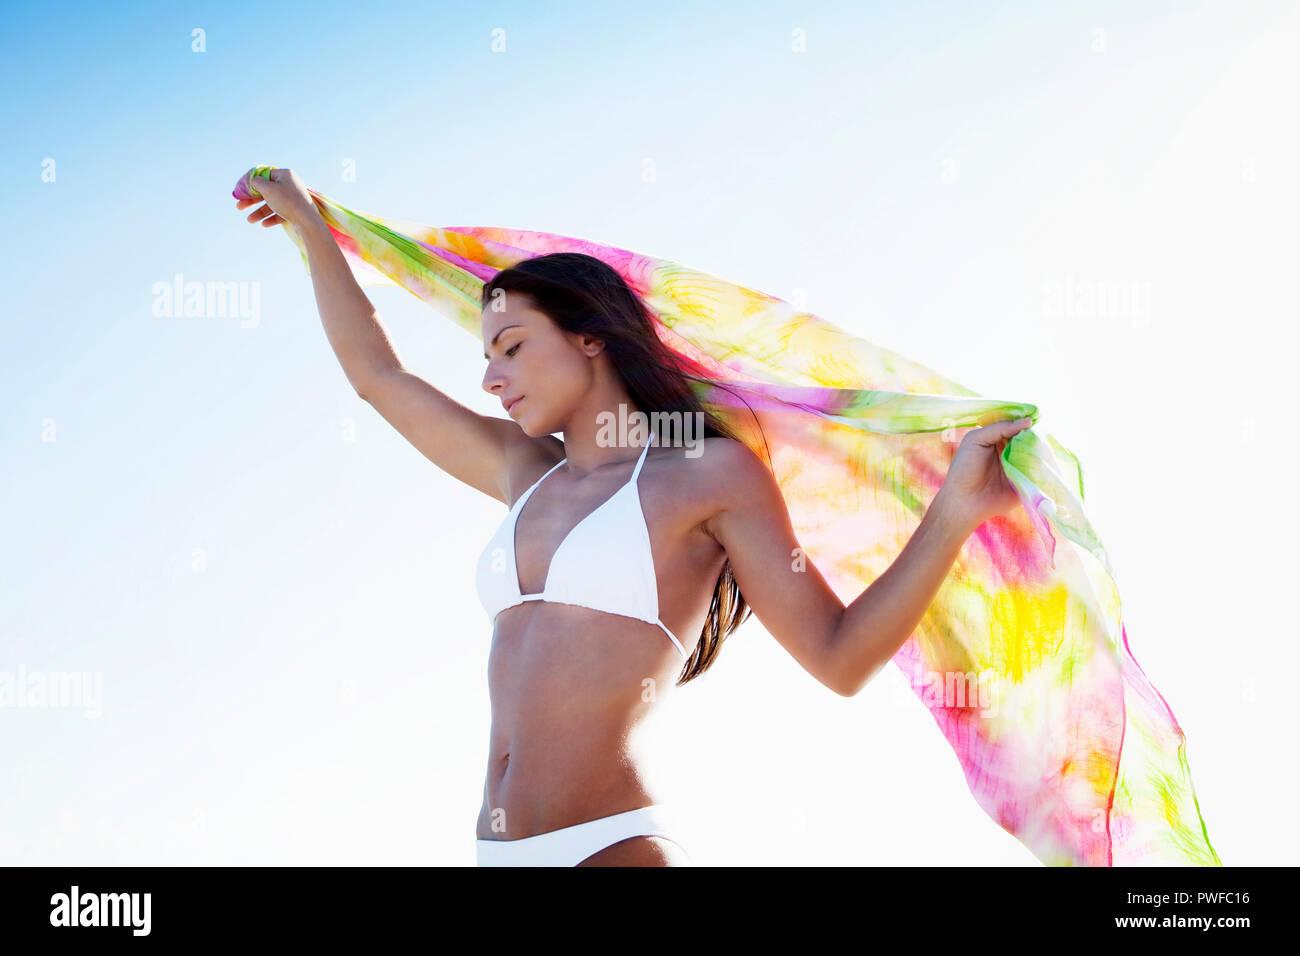 Woman in bikini at the beach, Miami, Florida, USA. Stock Photo